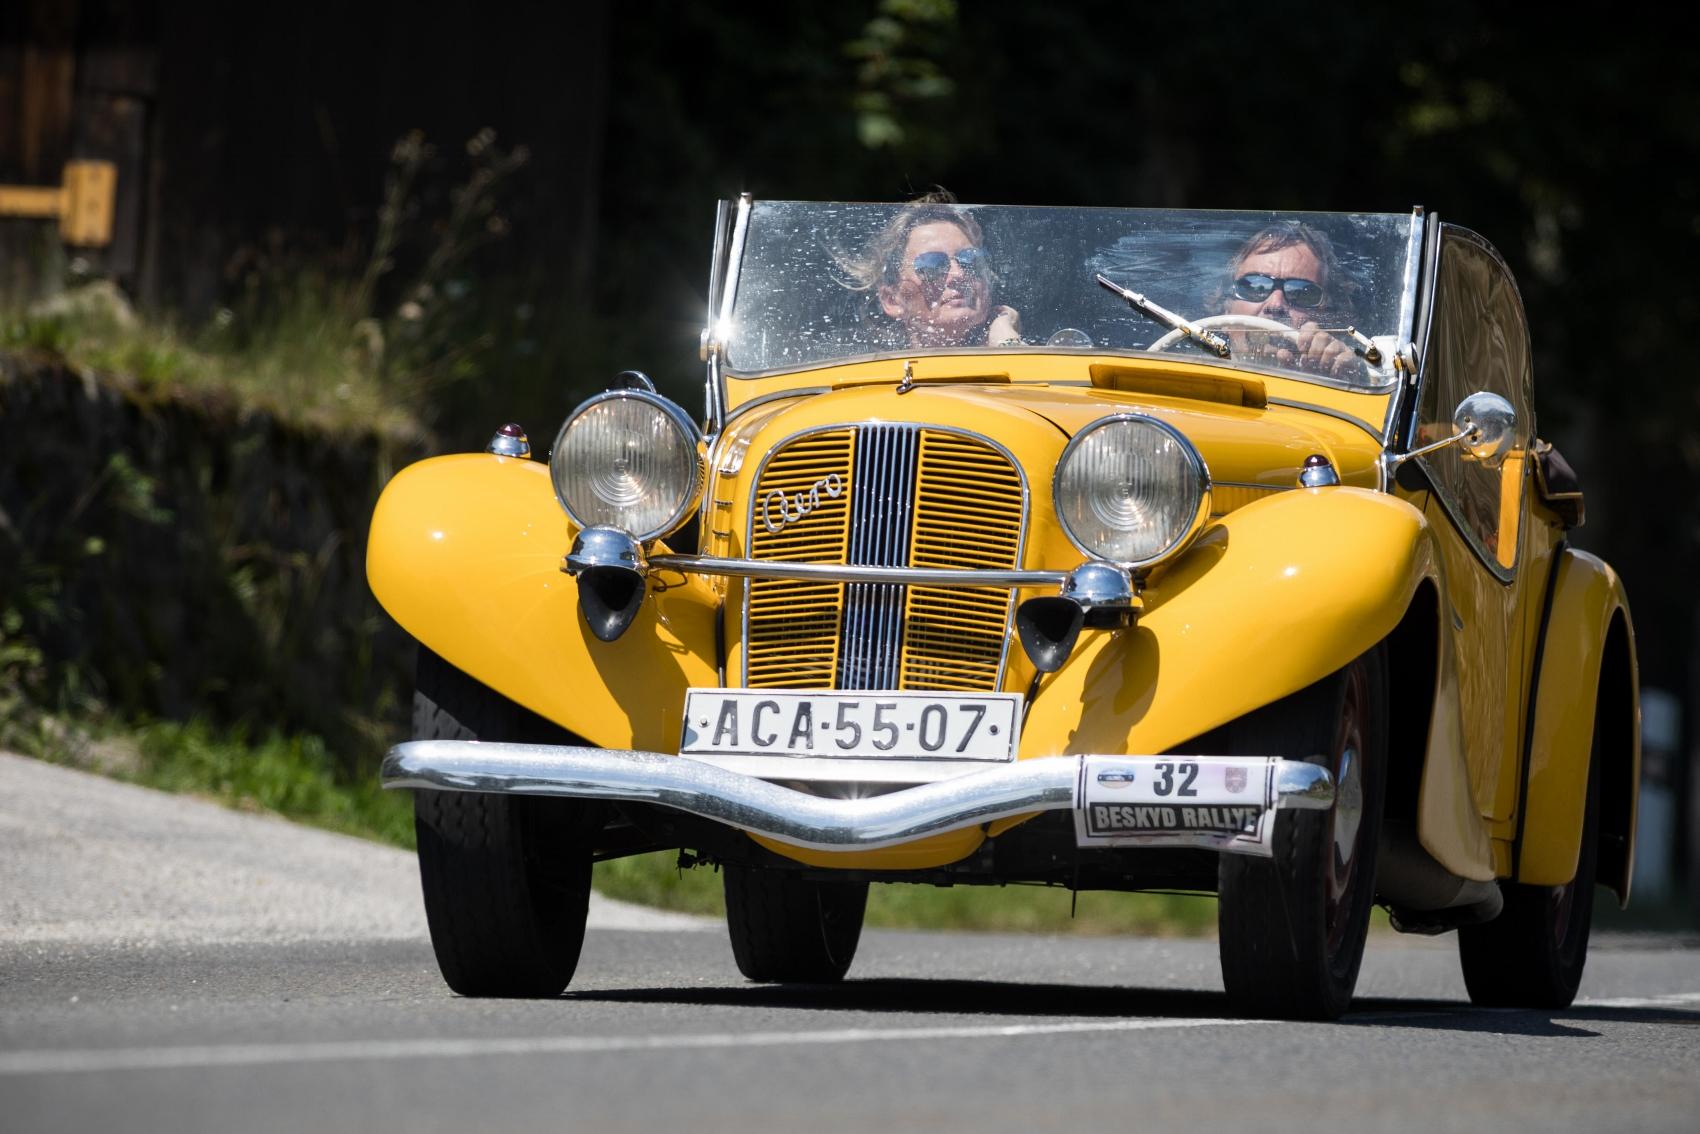 Pozrite si galériu z podujatia Beskyd Rallye – memoriál Ladislava Dlhopolčeka 2020 nPGqdq2Q0i turzov